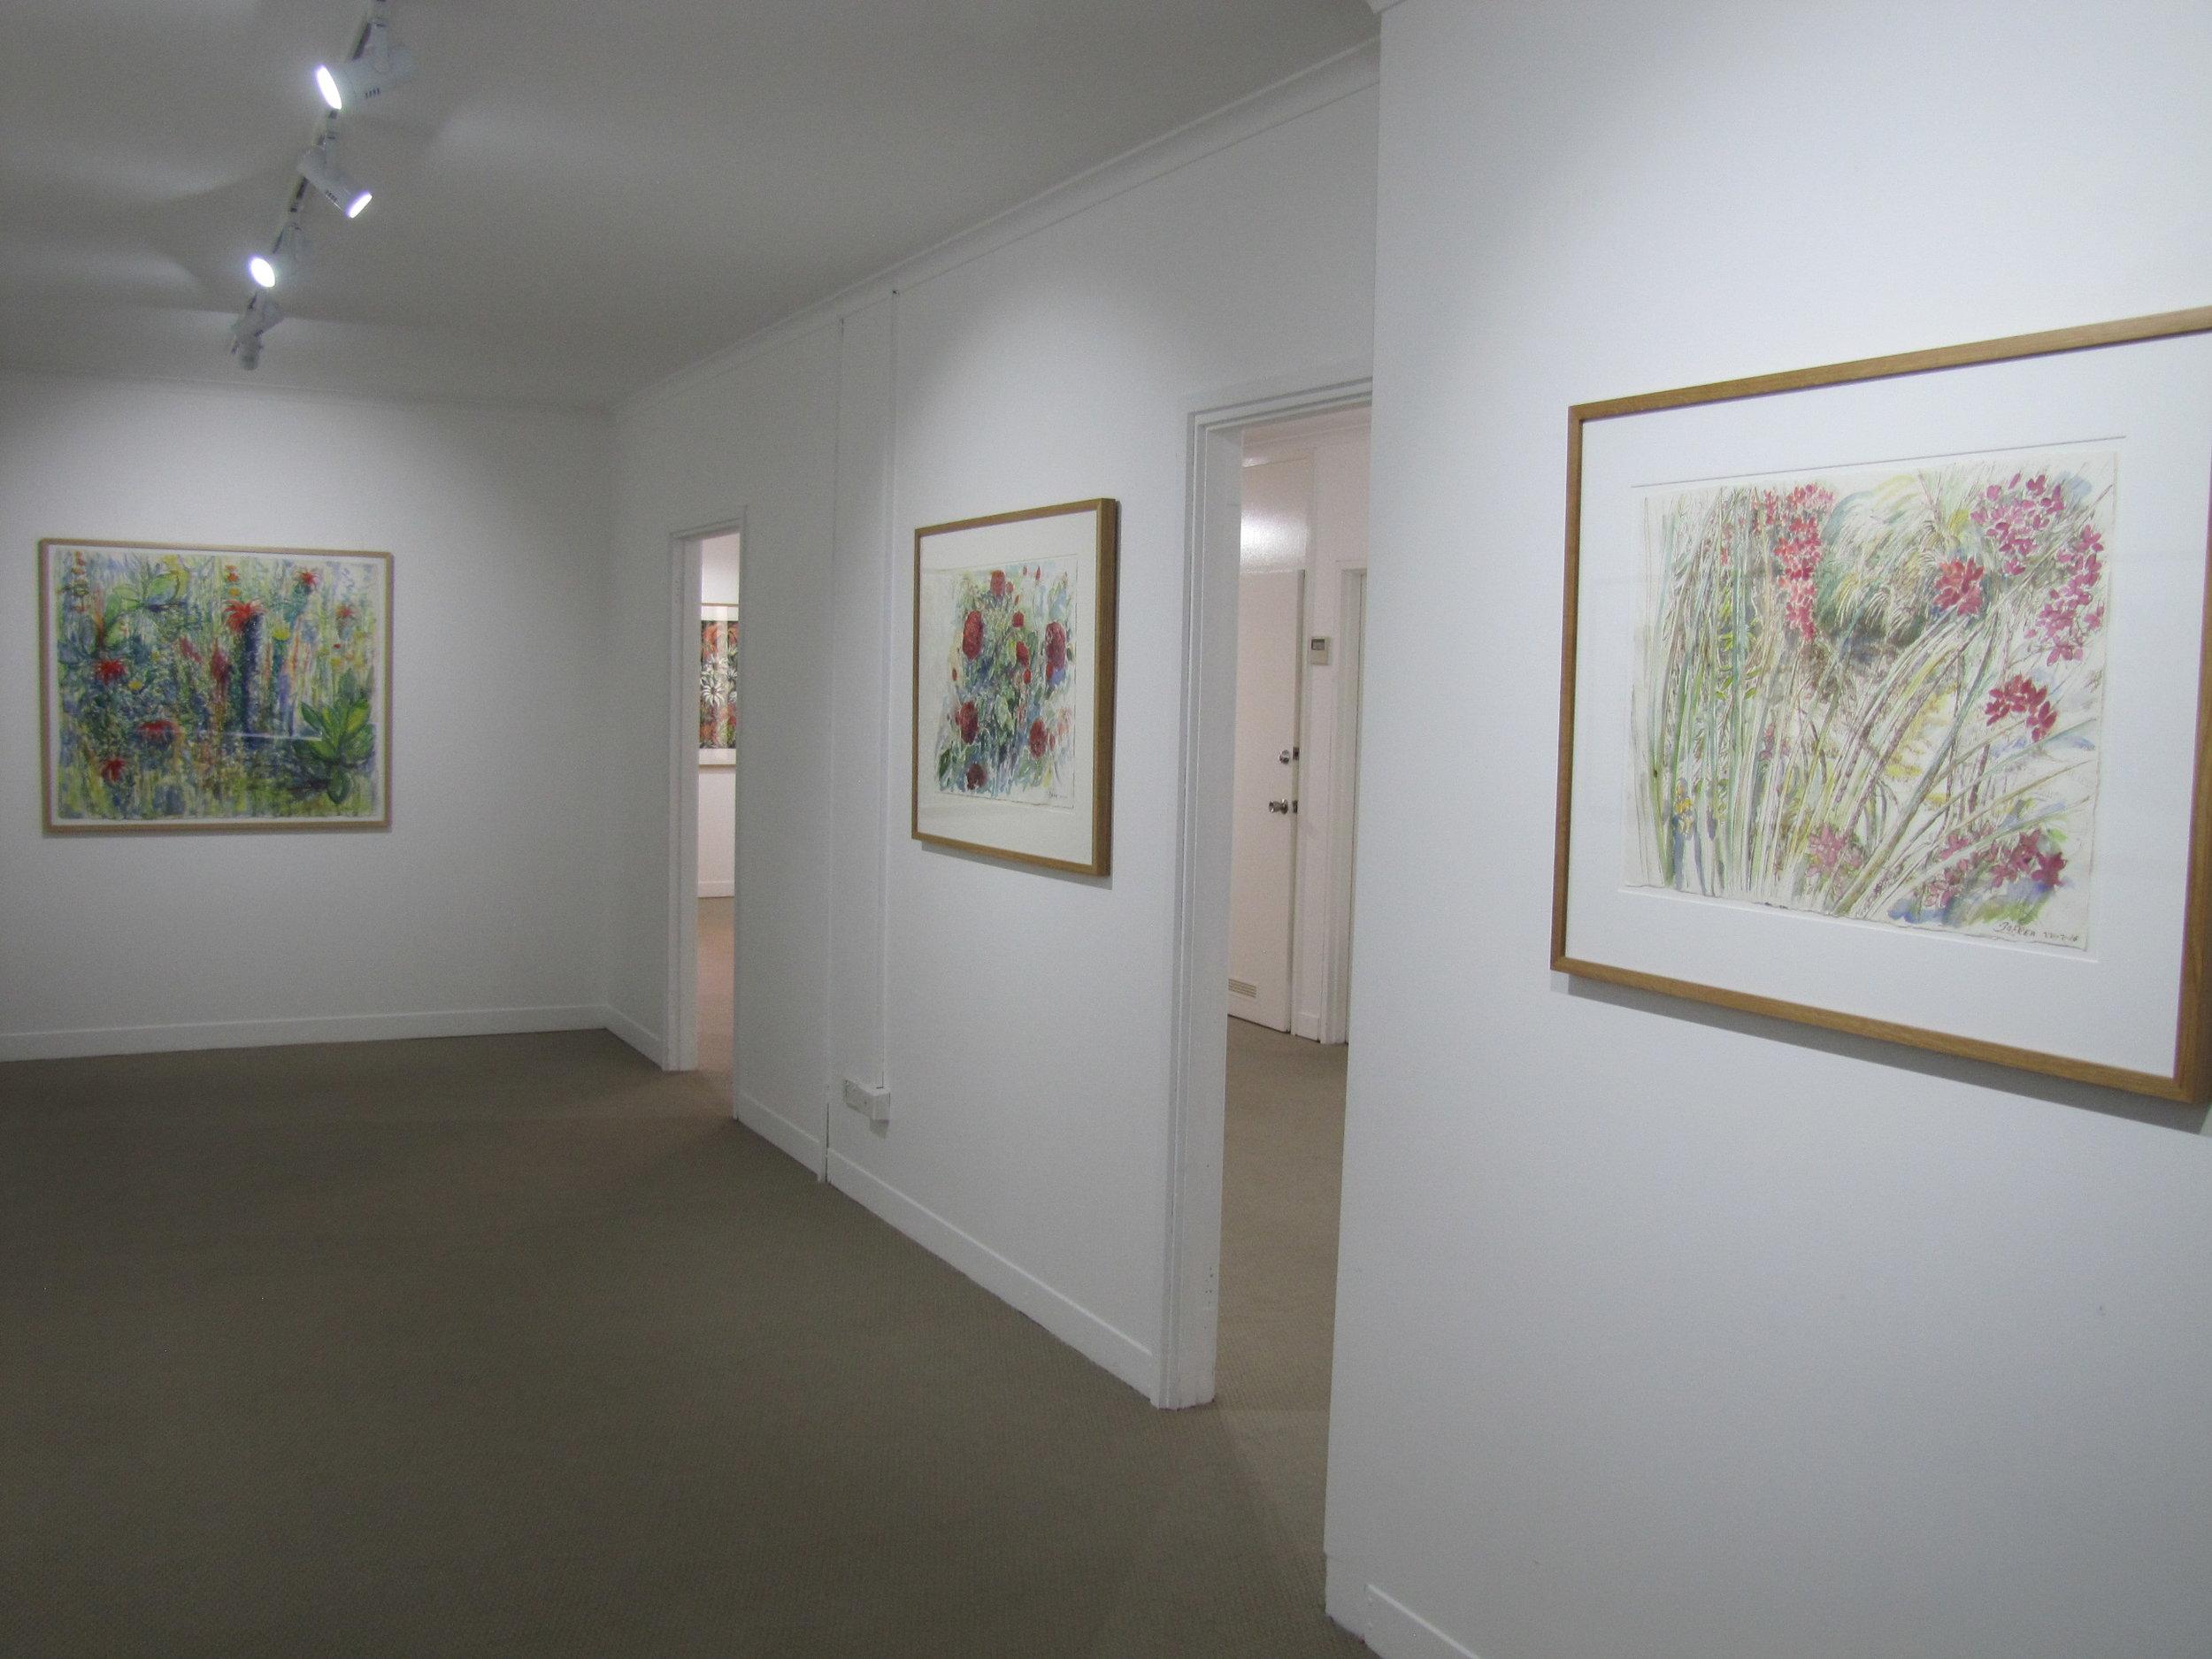 NSG. Zofrea exhibition. Exhibition view 8.jpg